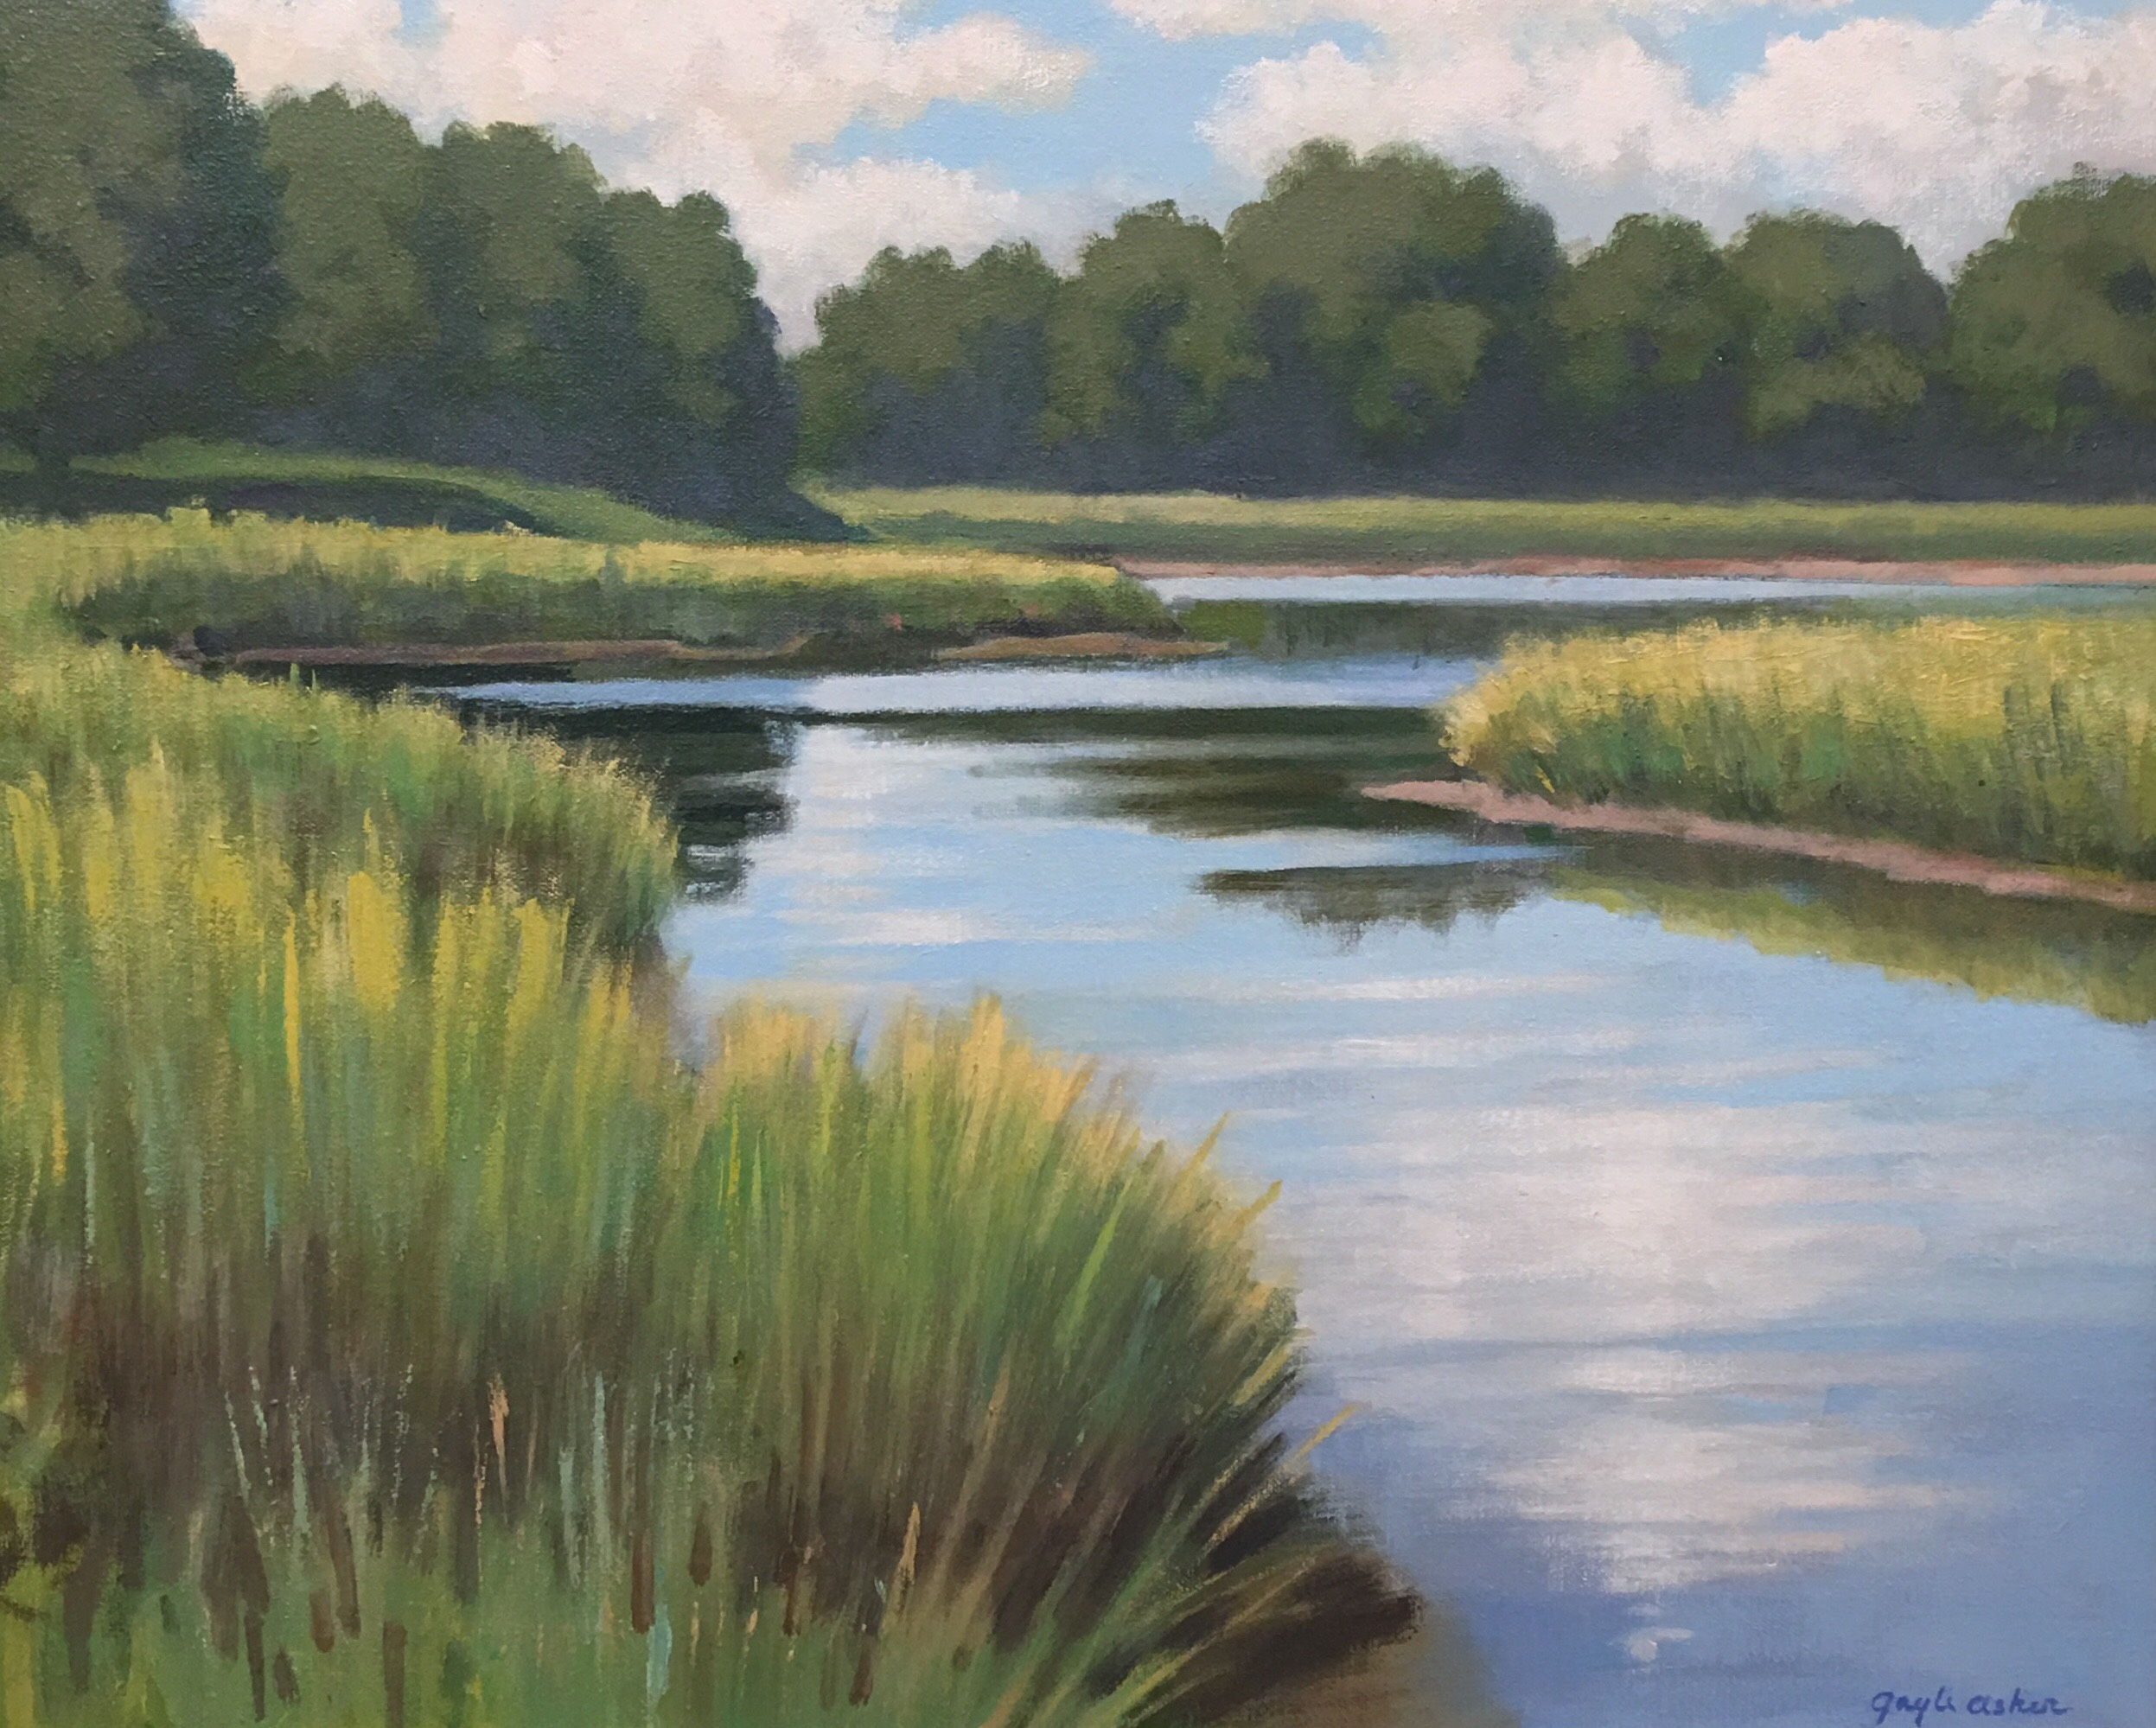 Waterworks: Lyme Art Association Marine Show and Hudson Valley Art Association